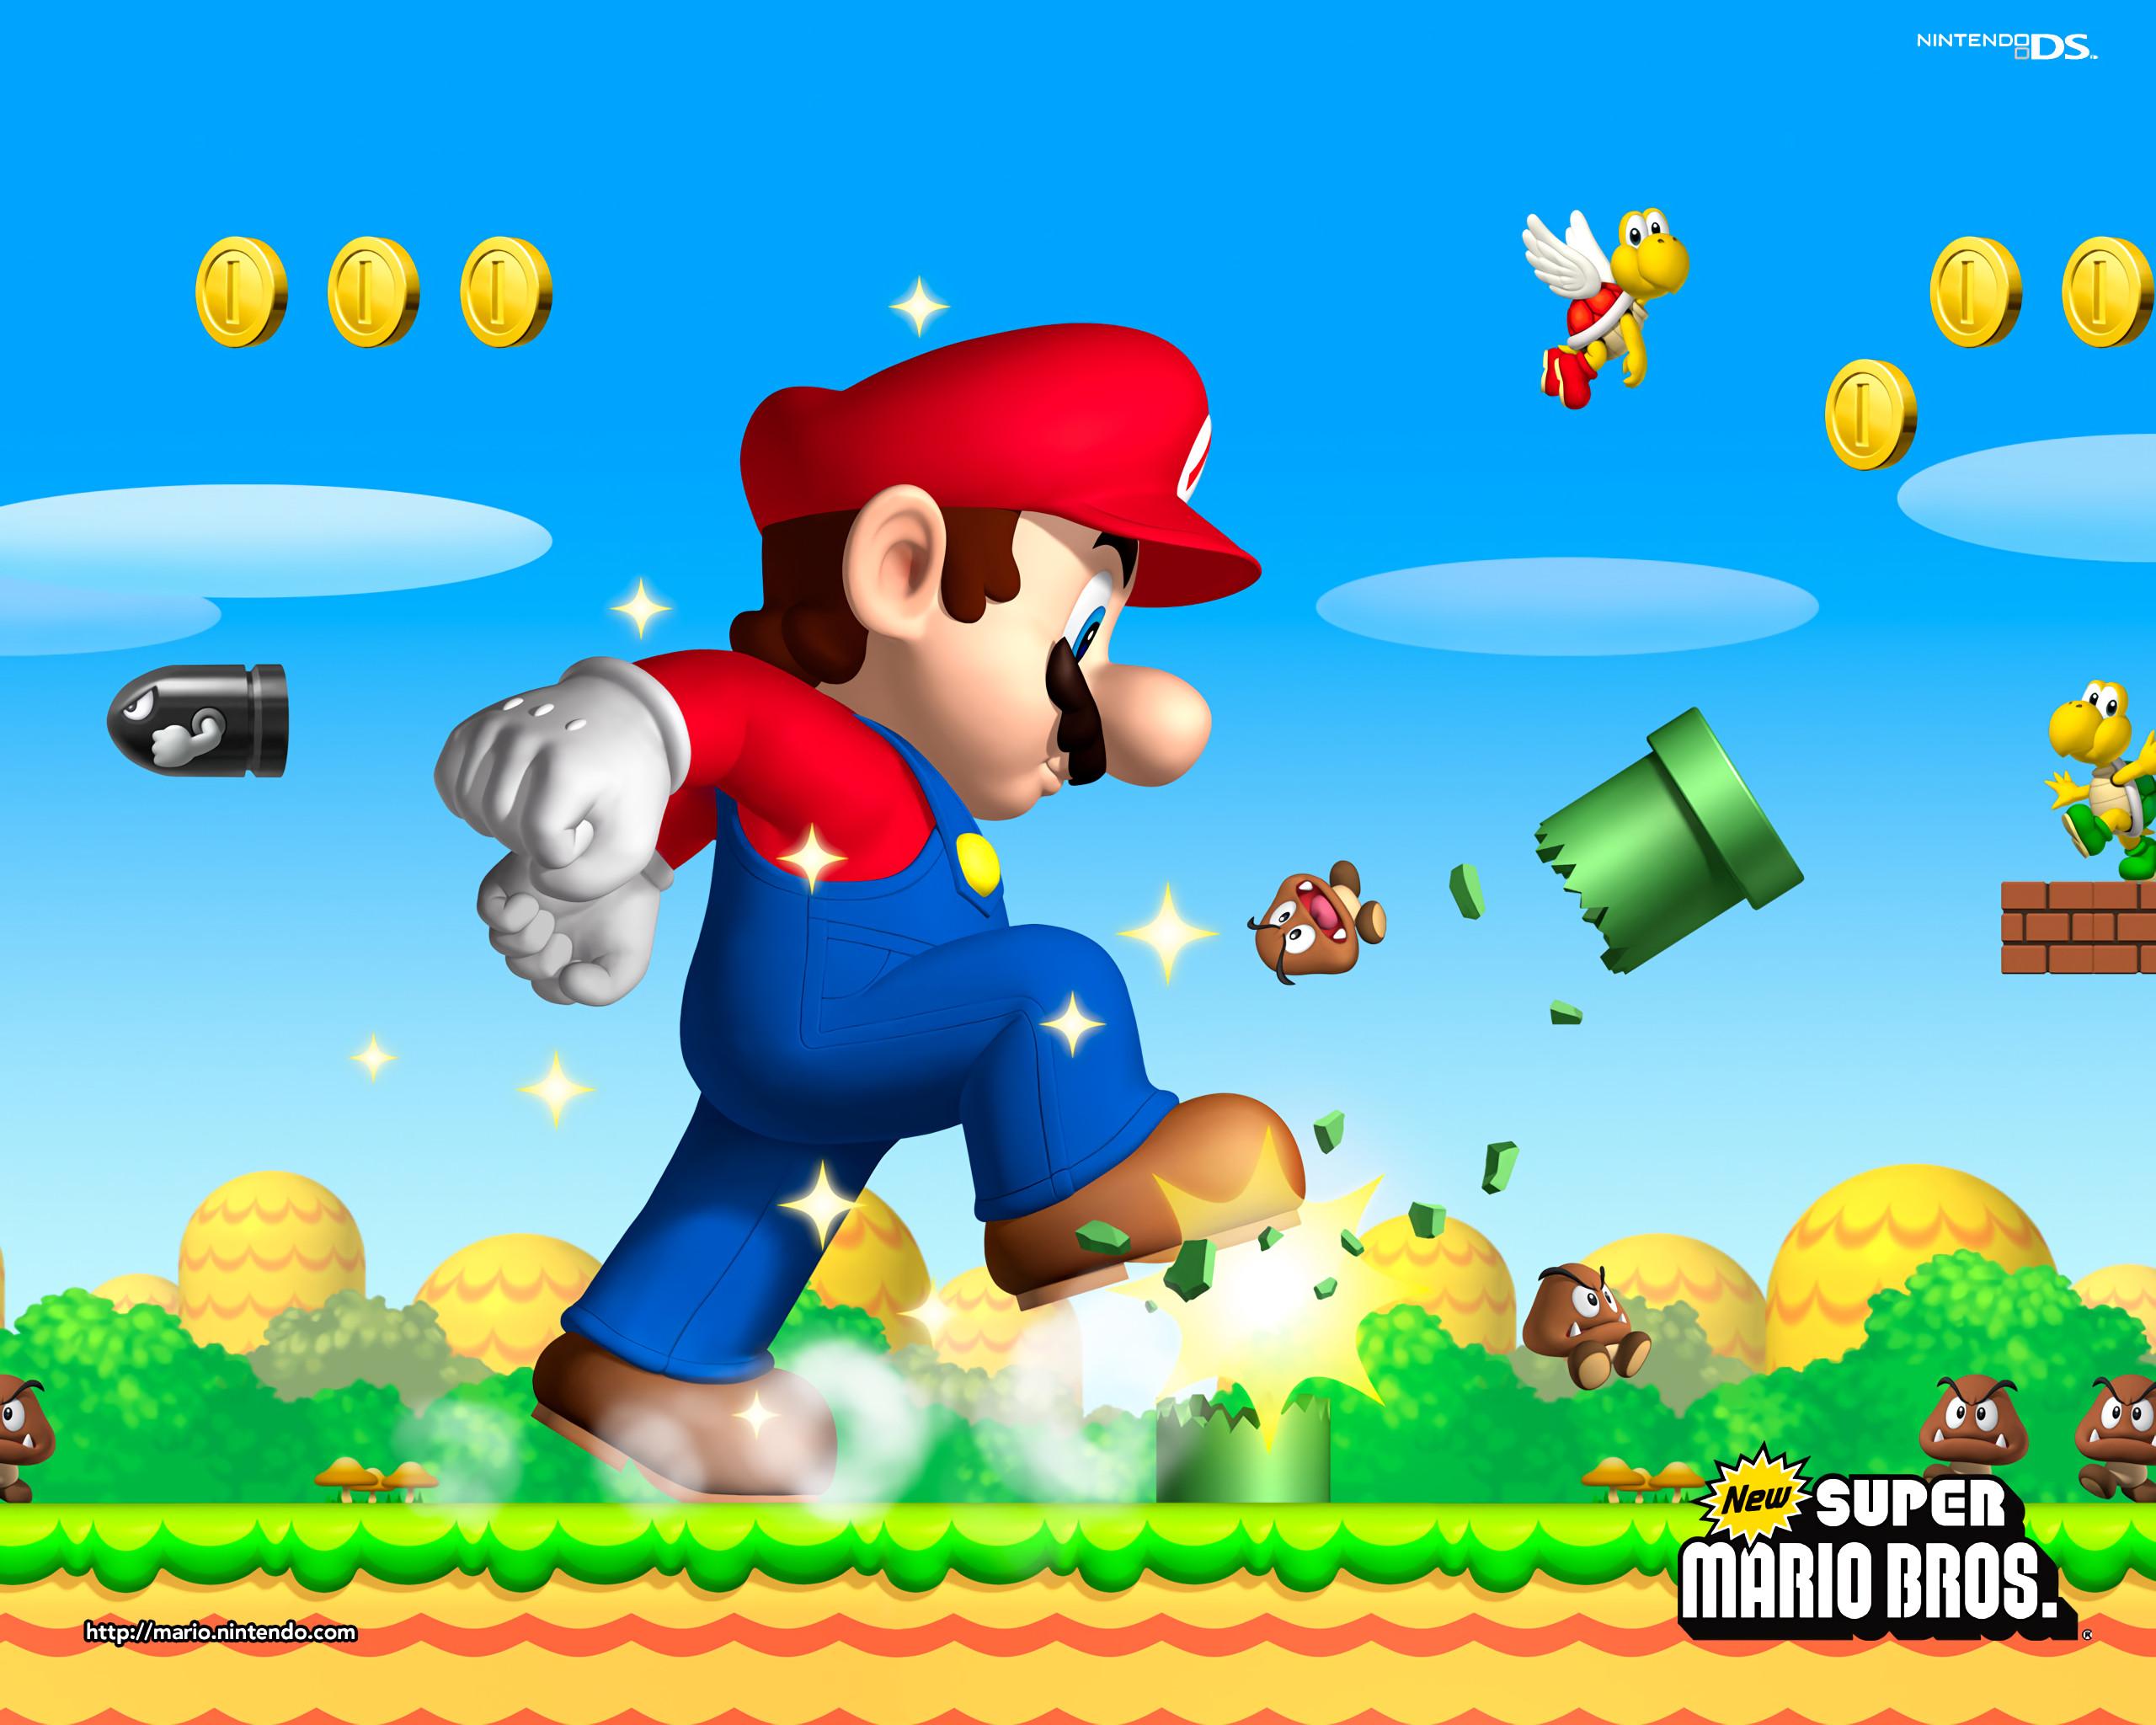 Video Game – Super Mario Bros. Mario Goomba Bill Ball Koopa Troopa Wallpaper